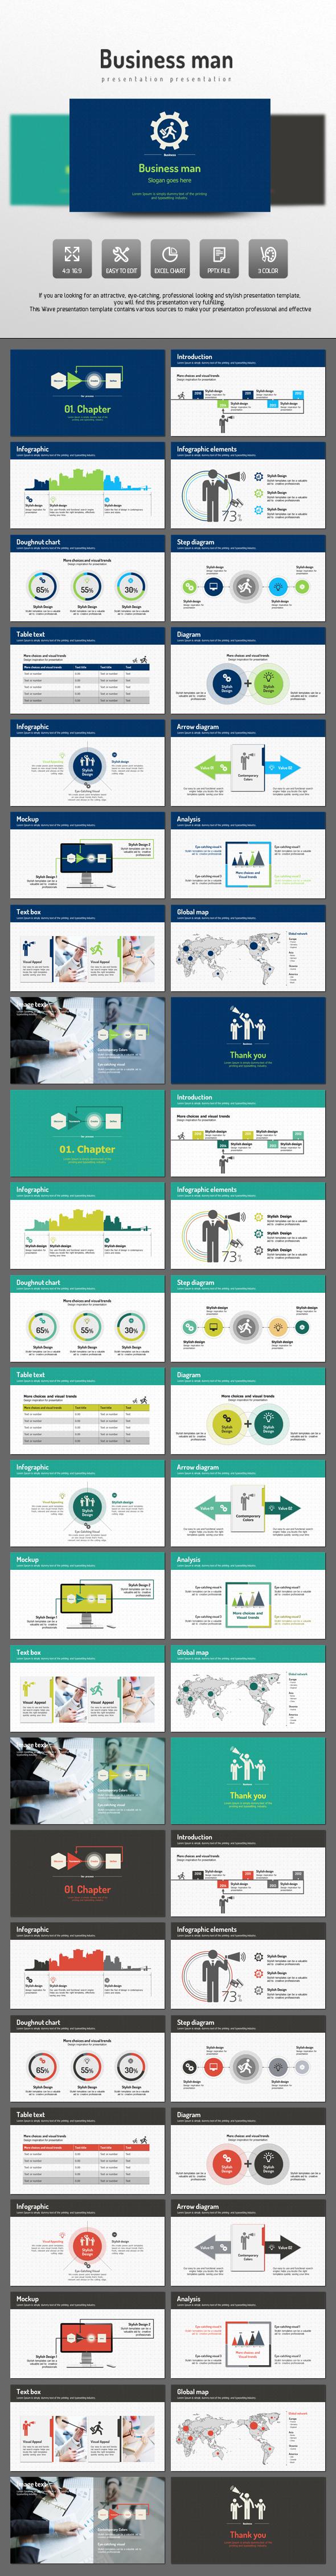 Business Man  - PowerPoint Templates Presentation Templates